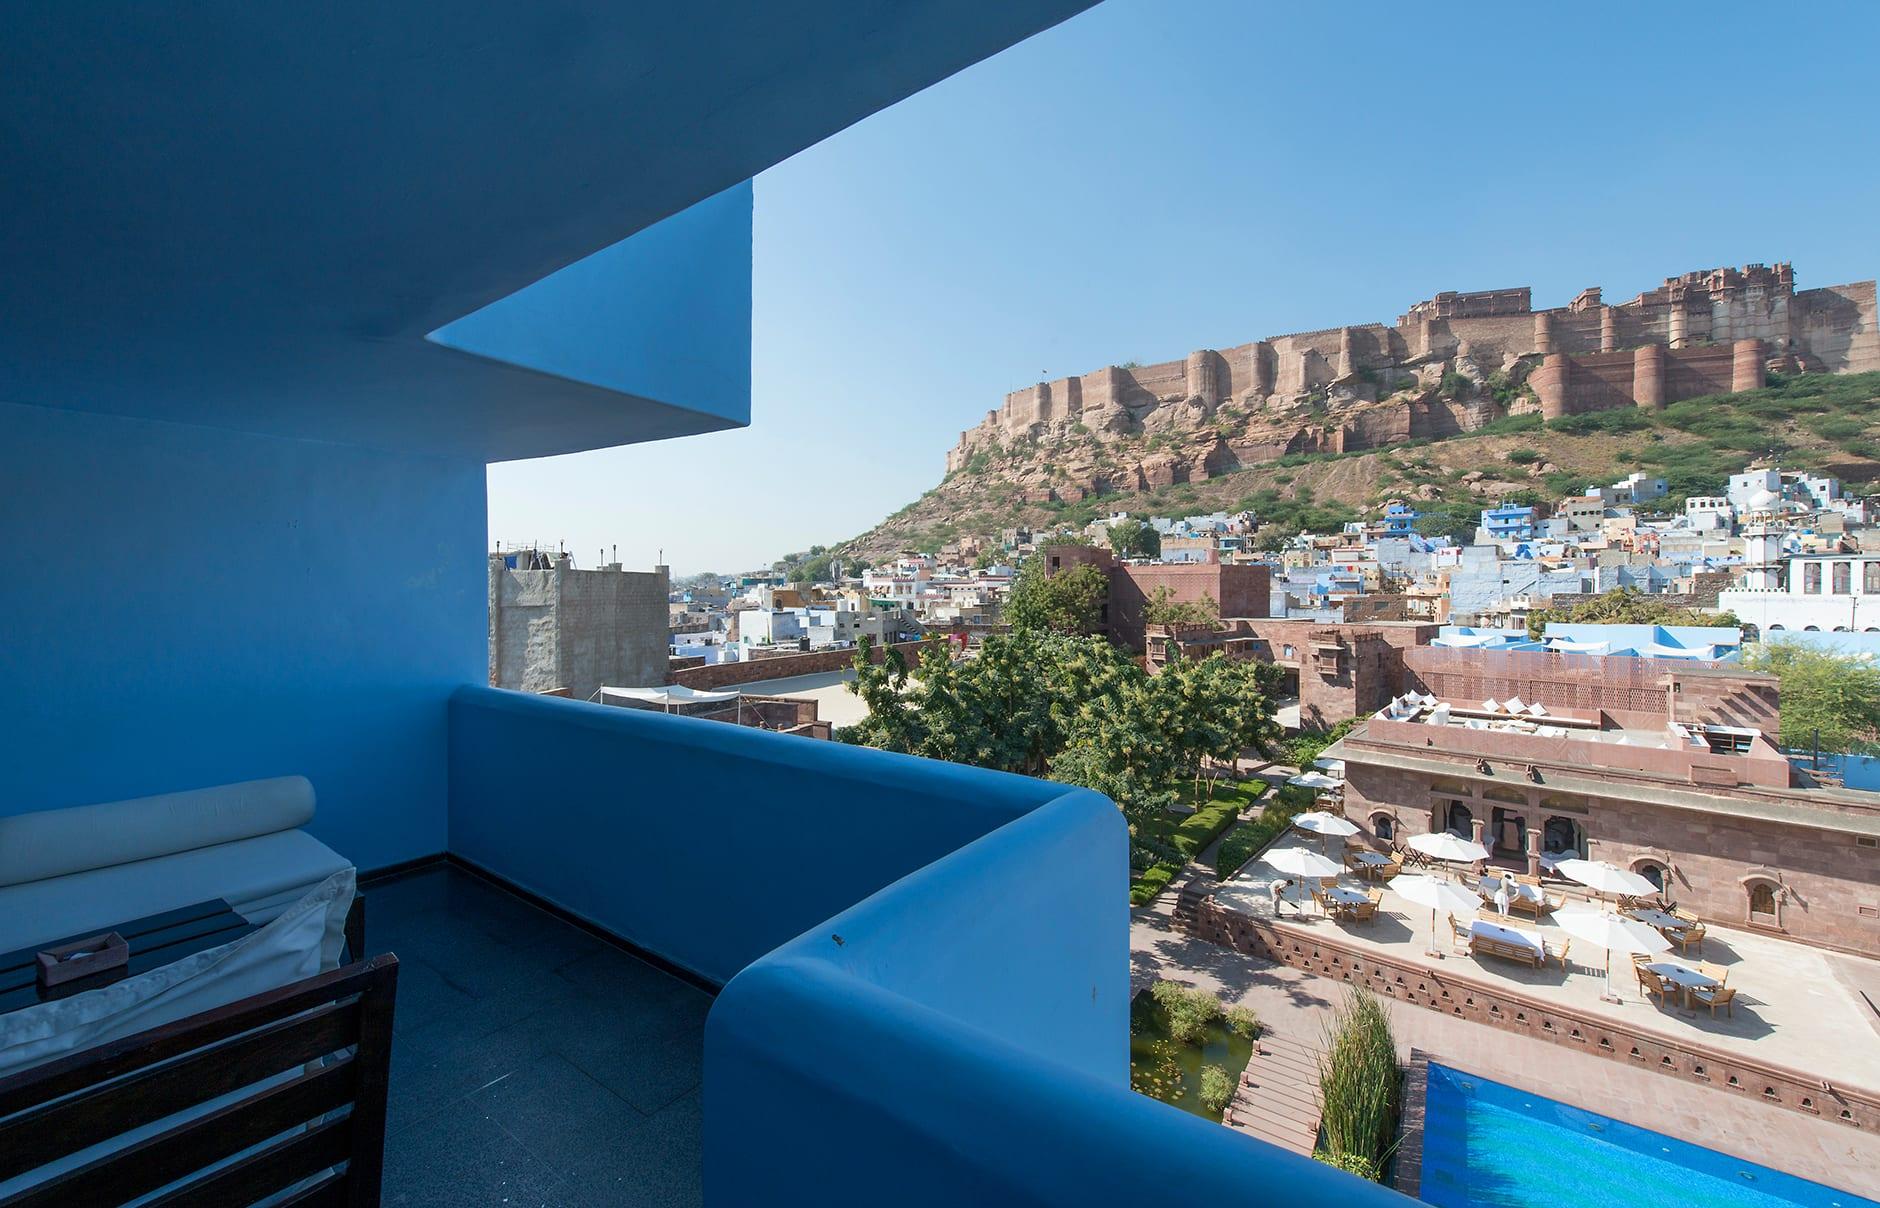 Duplex Suite. Raas Jodhpur, India. © Rass